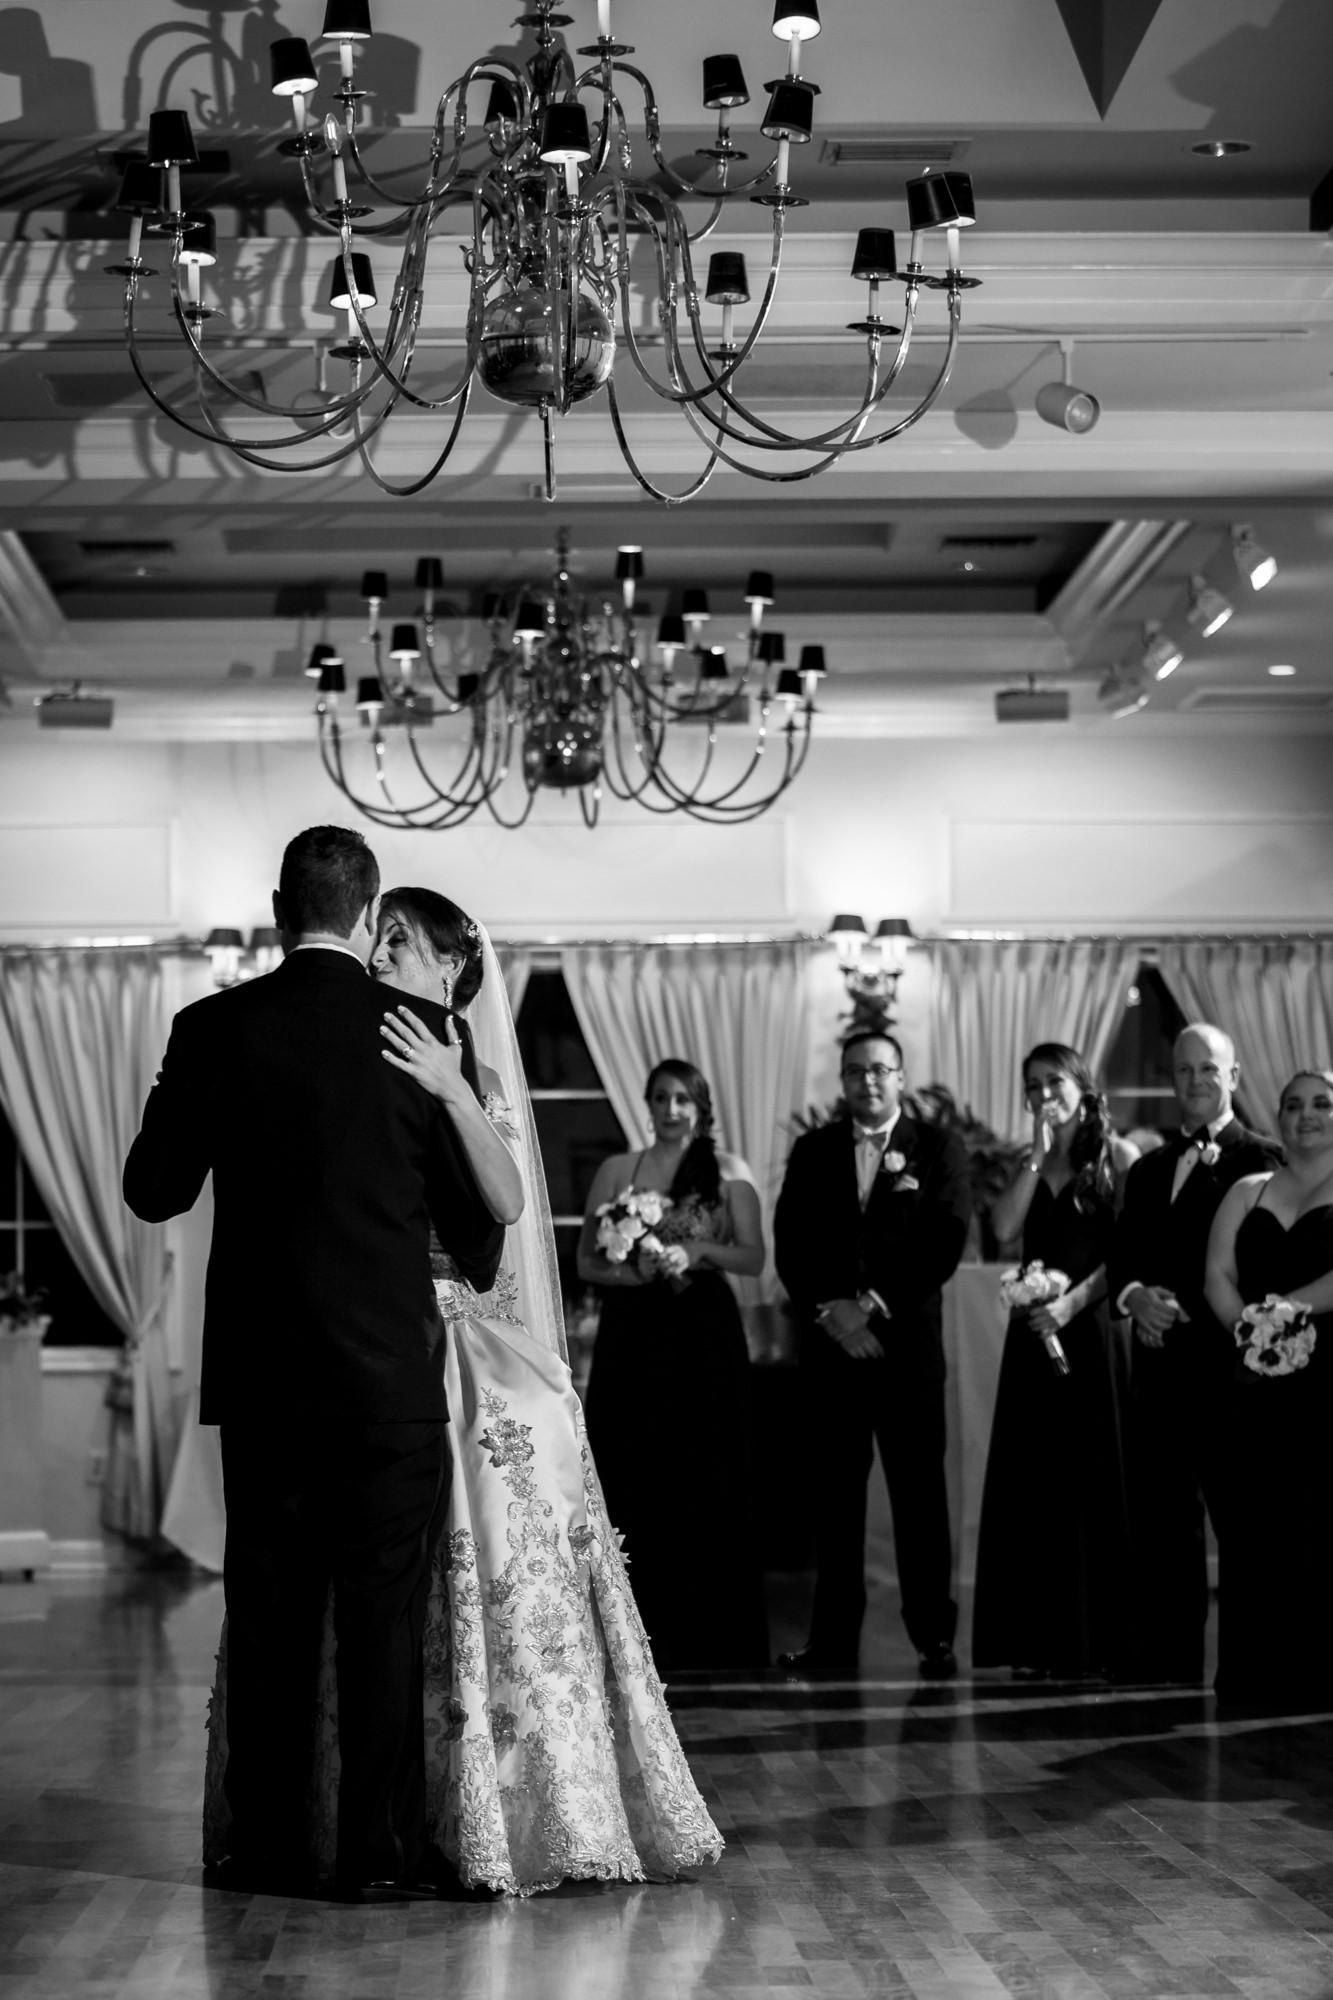 Benvenuto_Wedding_catholic_Florida_Bride-Groom-108.jpg